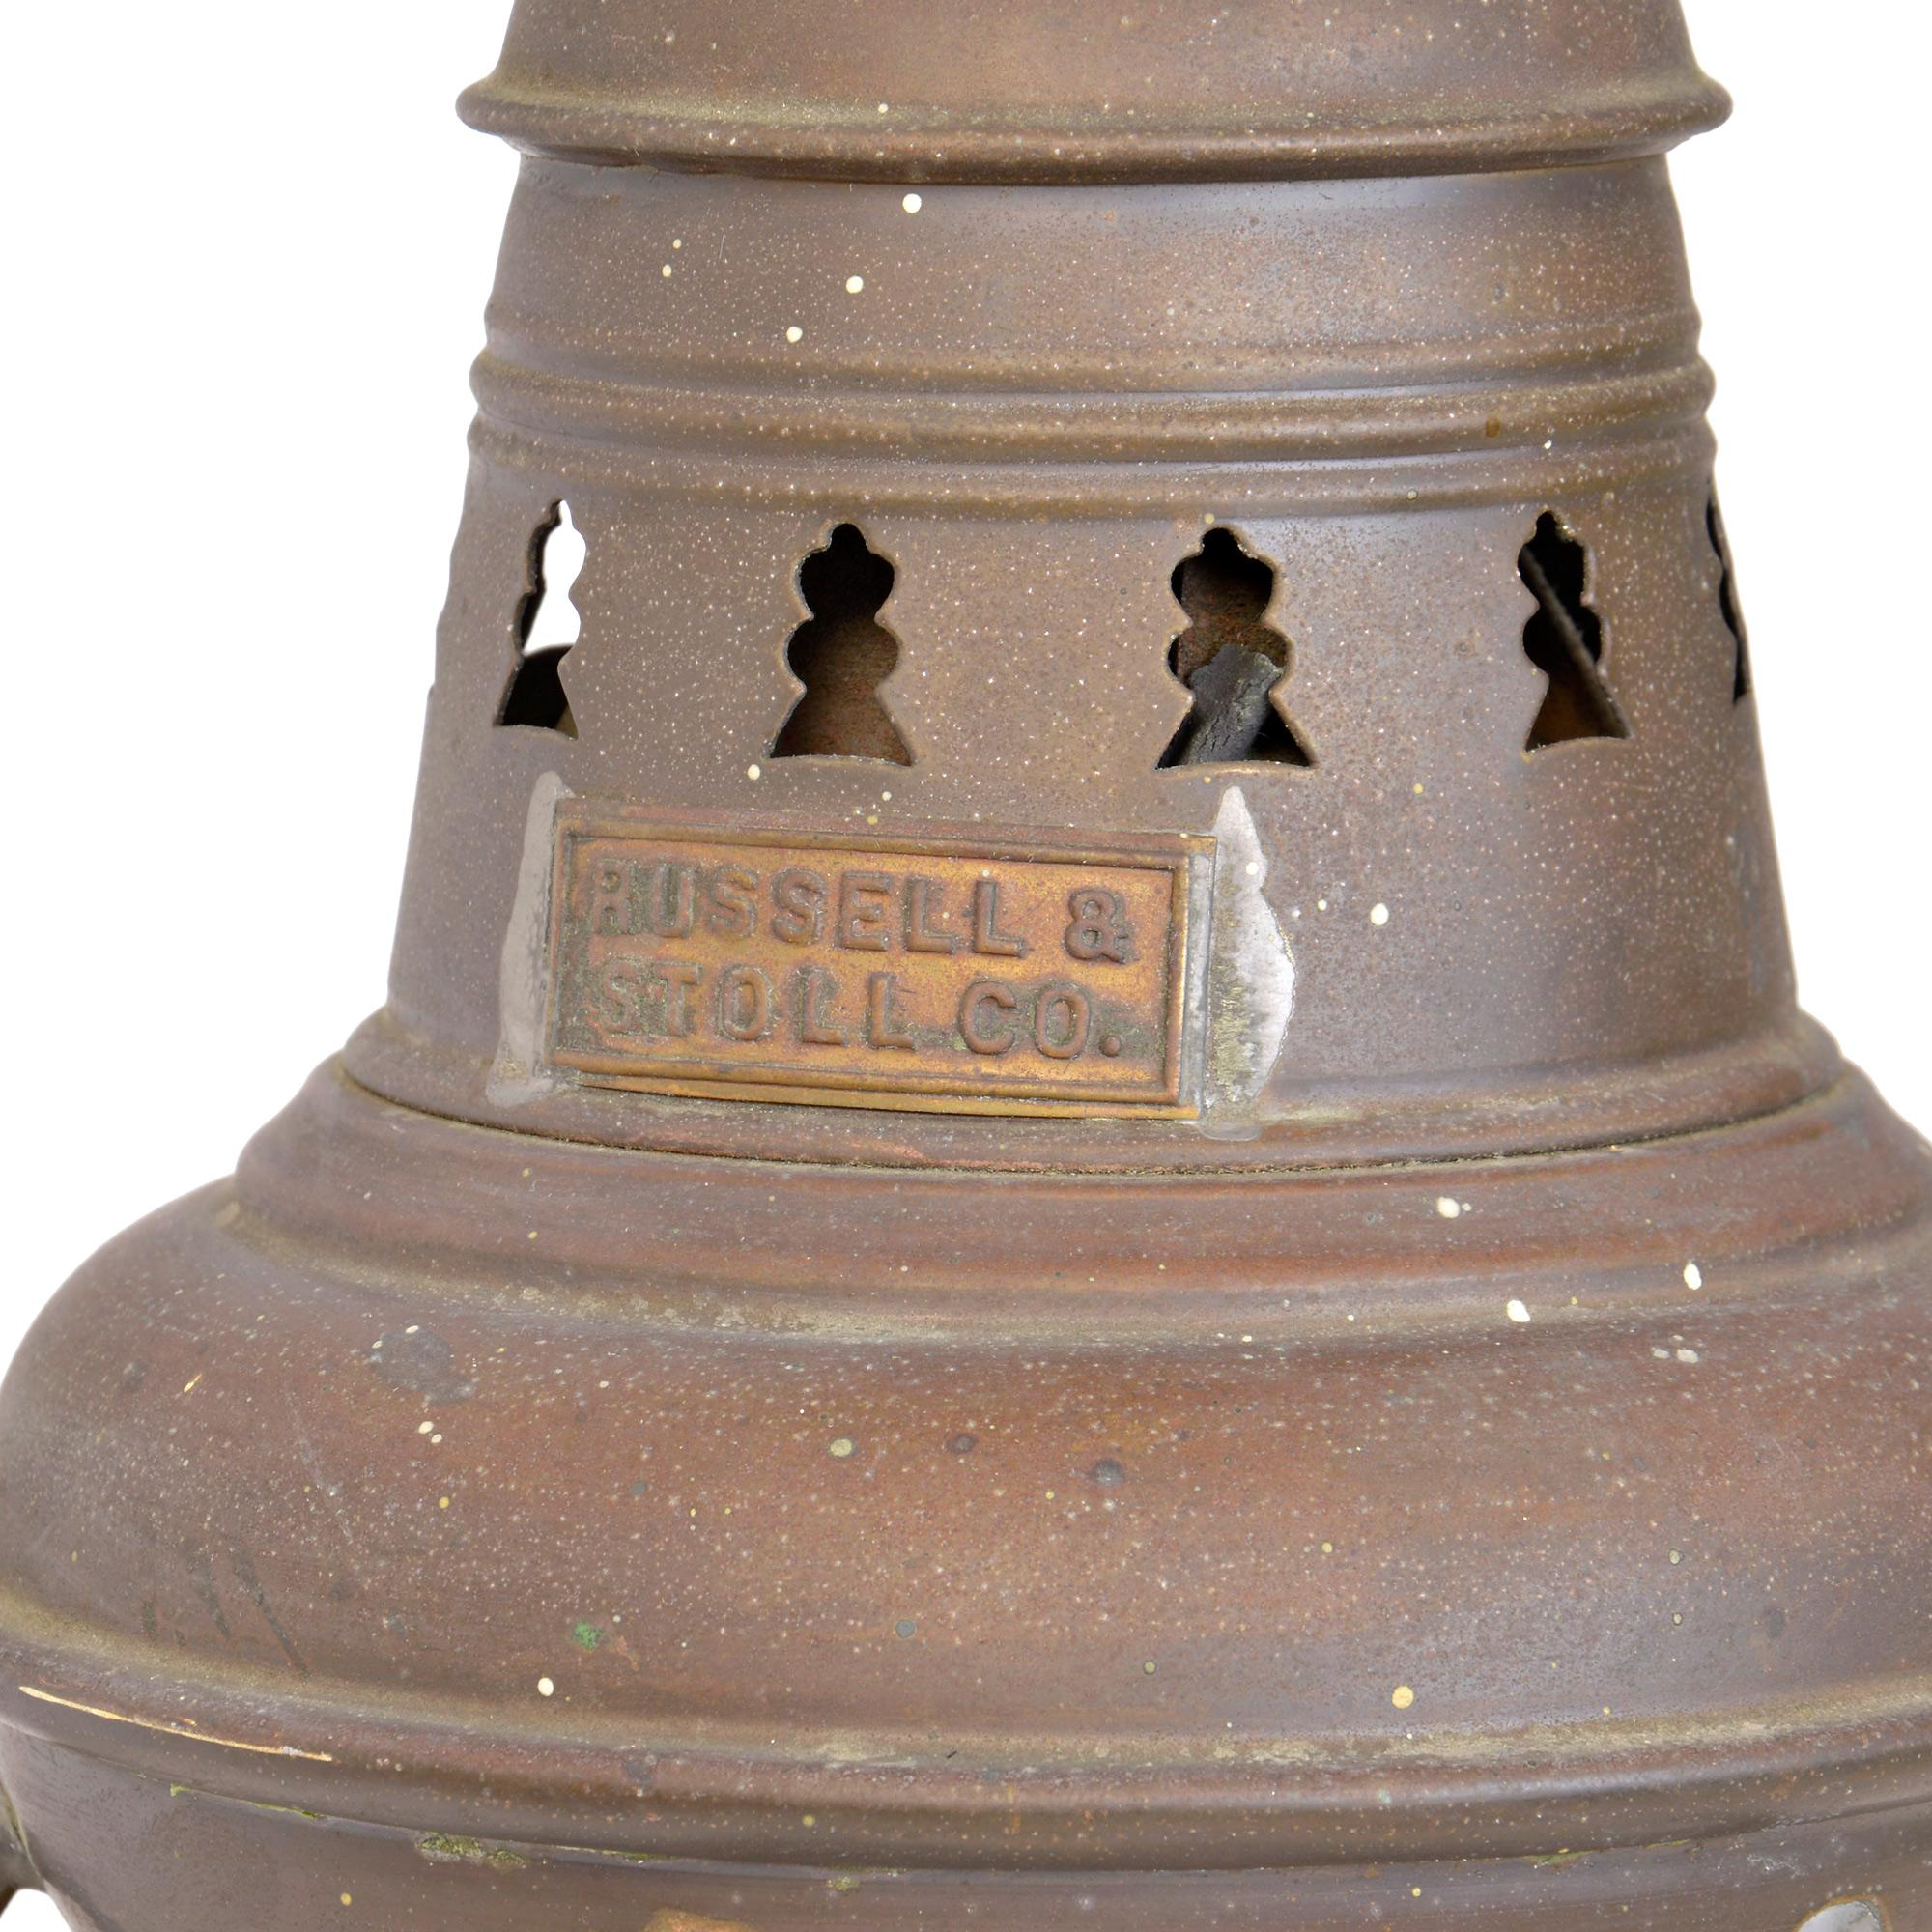 46522-russel-and-stoll-marine-light-mark.jpg